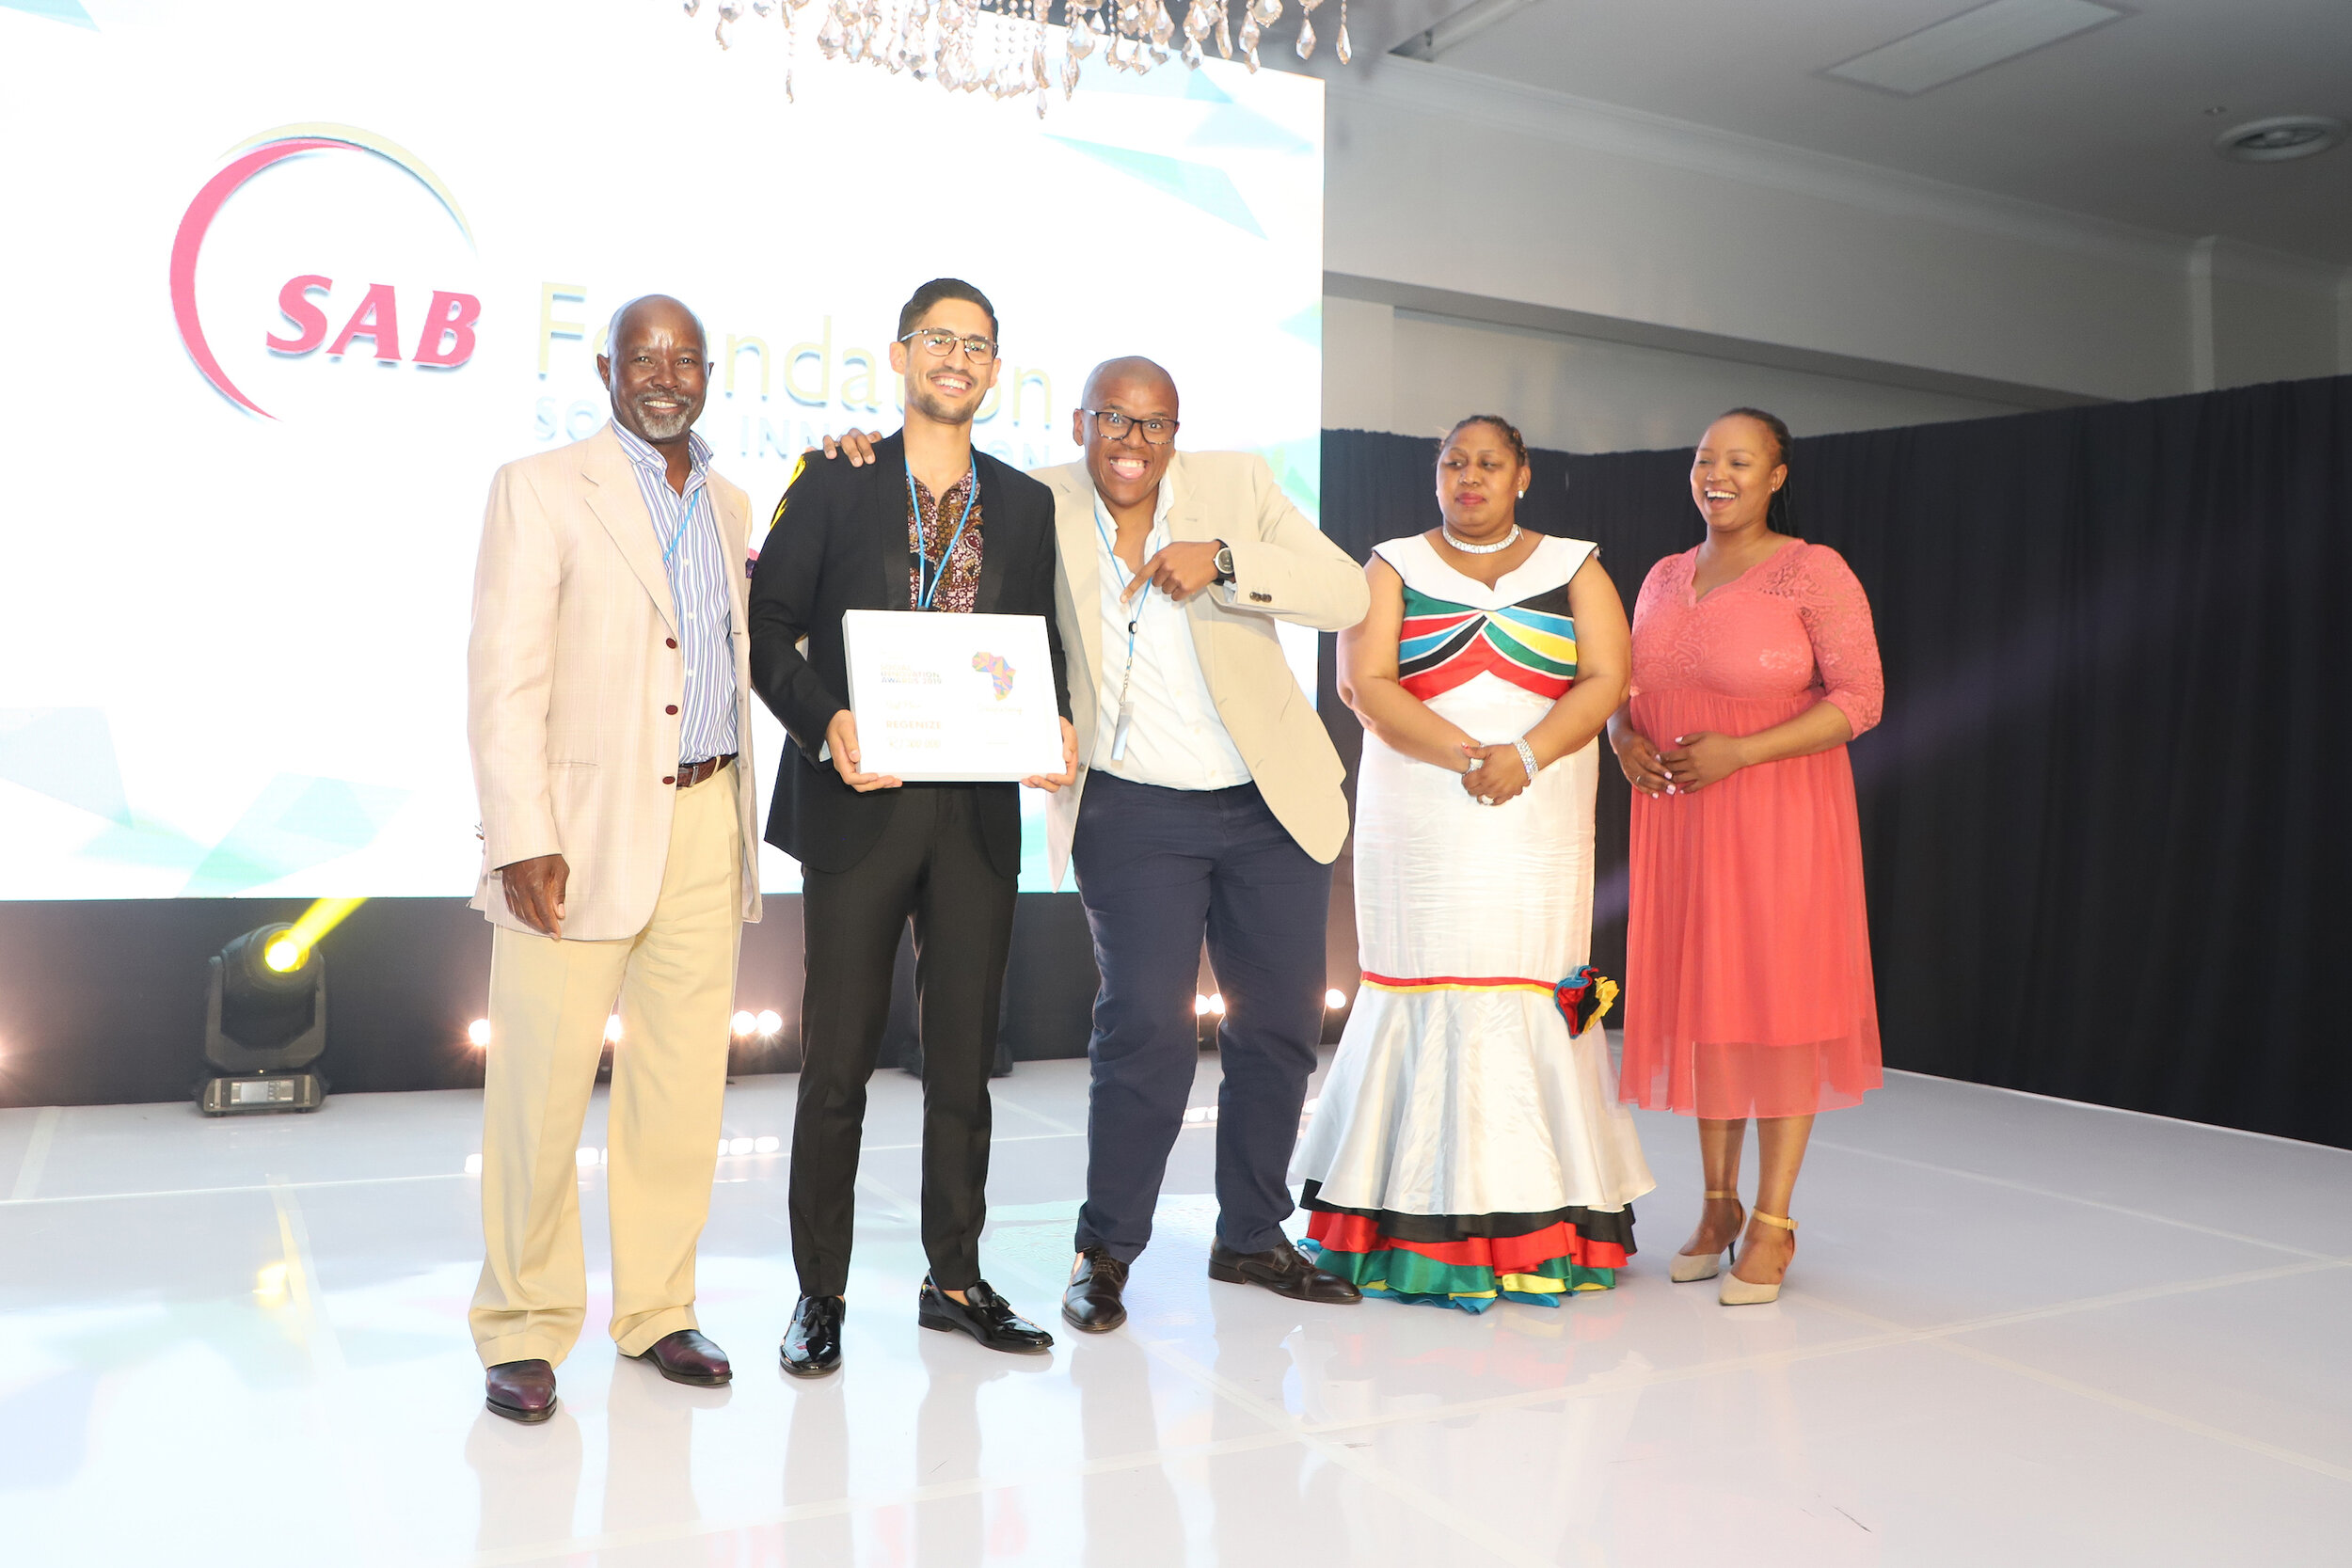 Pictured (left to right):       SAB Foundation Chairman and External Trustee; Moss Ngoasheng; Regenize, Social Innovation Awards winners Chad Robertson and business partner Nkazimlo Miti; Deputy Minister of Social Development, Hendrietta Bogopane-Zulu; and SAB Foundation Social Innovation Project Manager, Ntandokazi Nodada